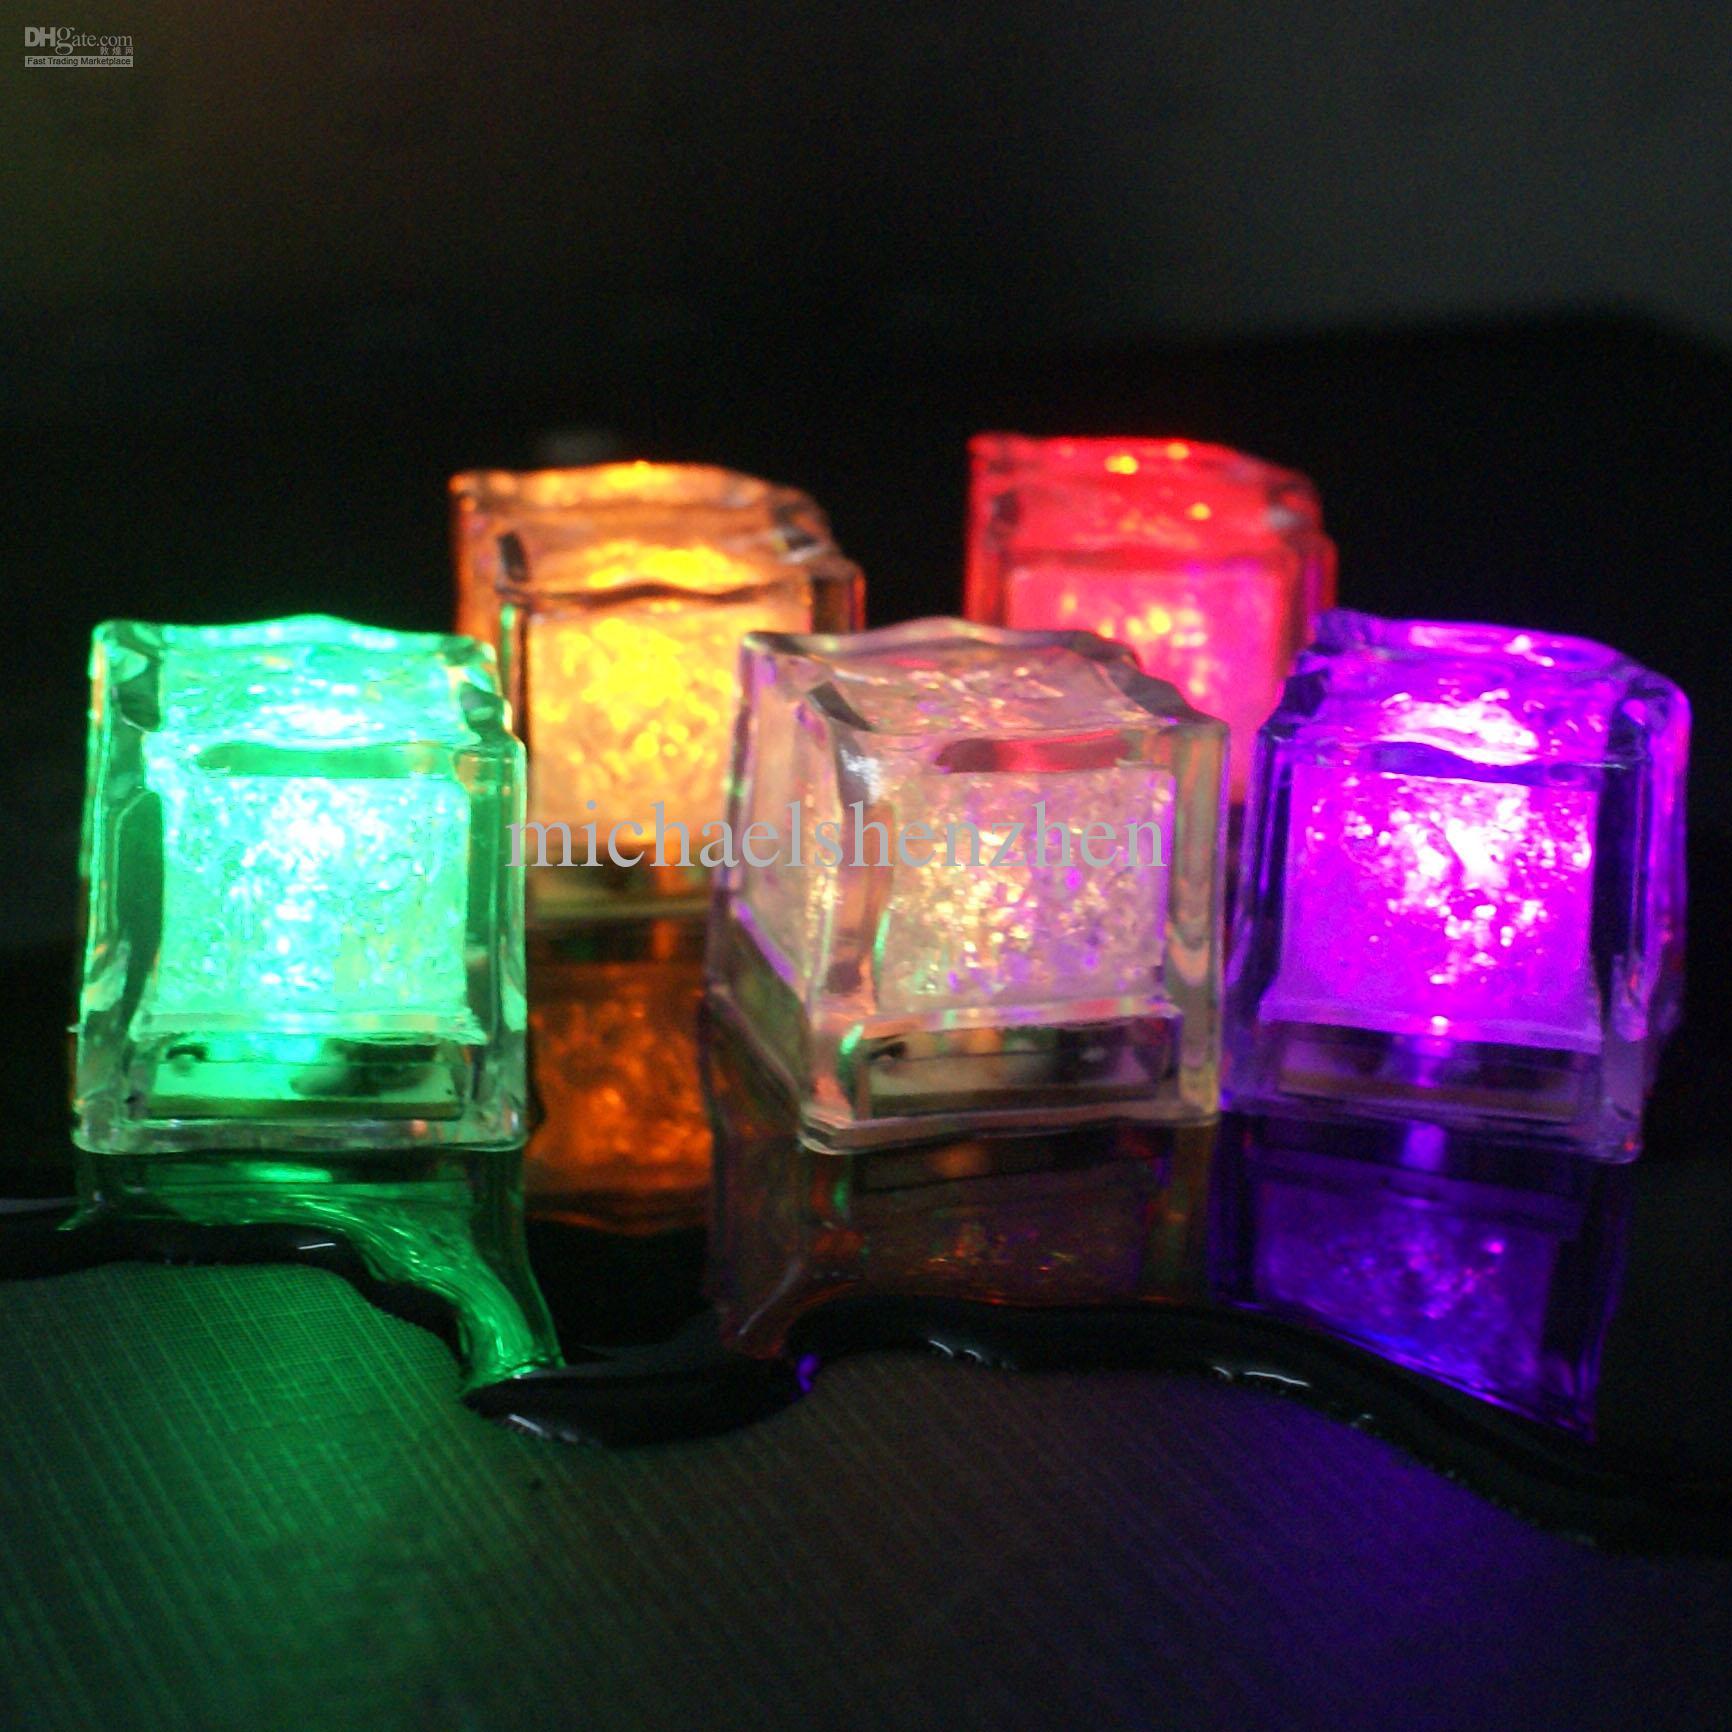 Hielo luminoso Plaza navideña Lámpara de hielo de colores colorida Noche de luz LED Festival de la fiesta Suministros Fiesta o boda Juguetes de LED